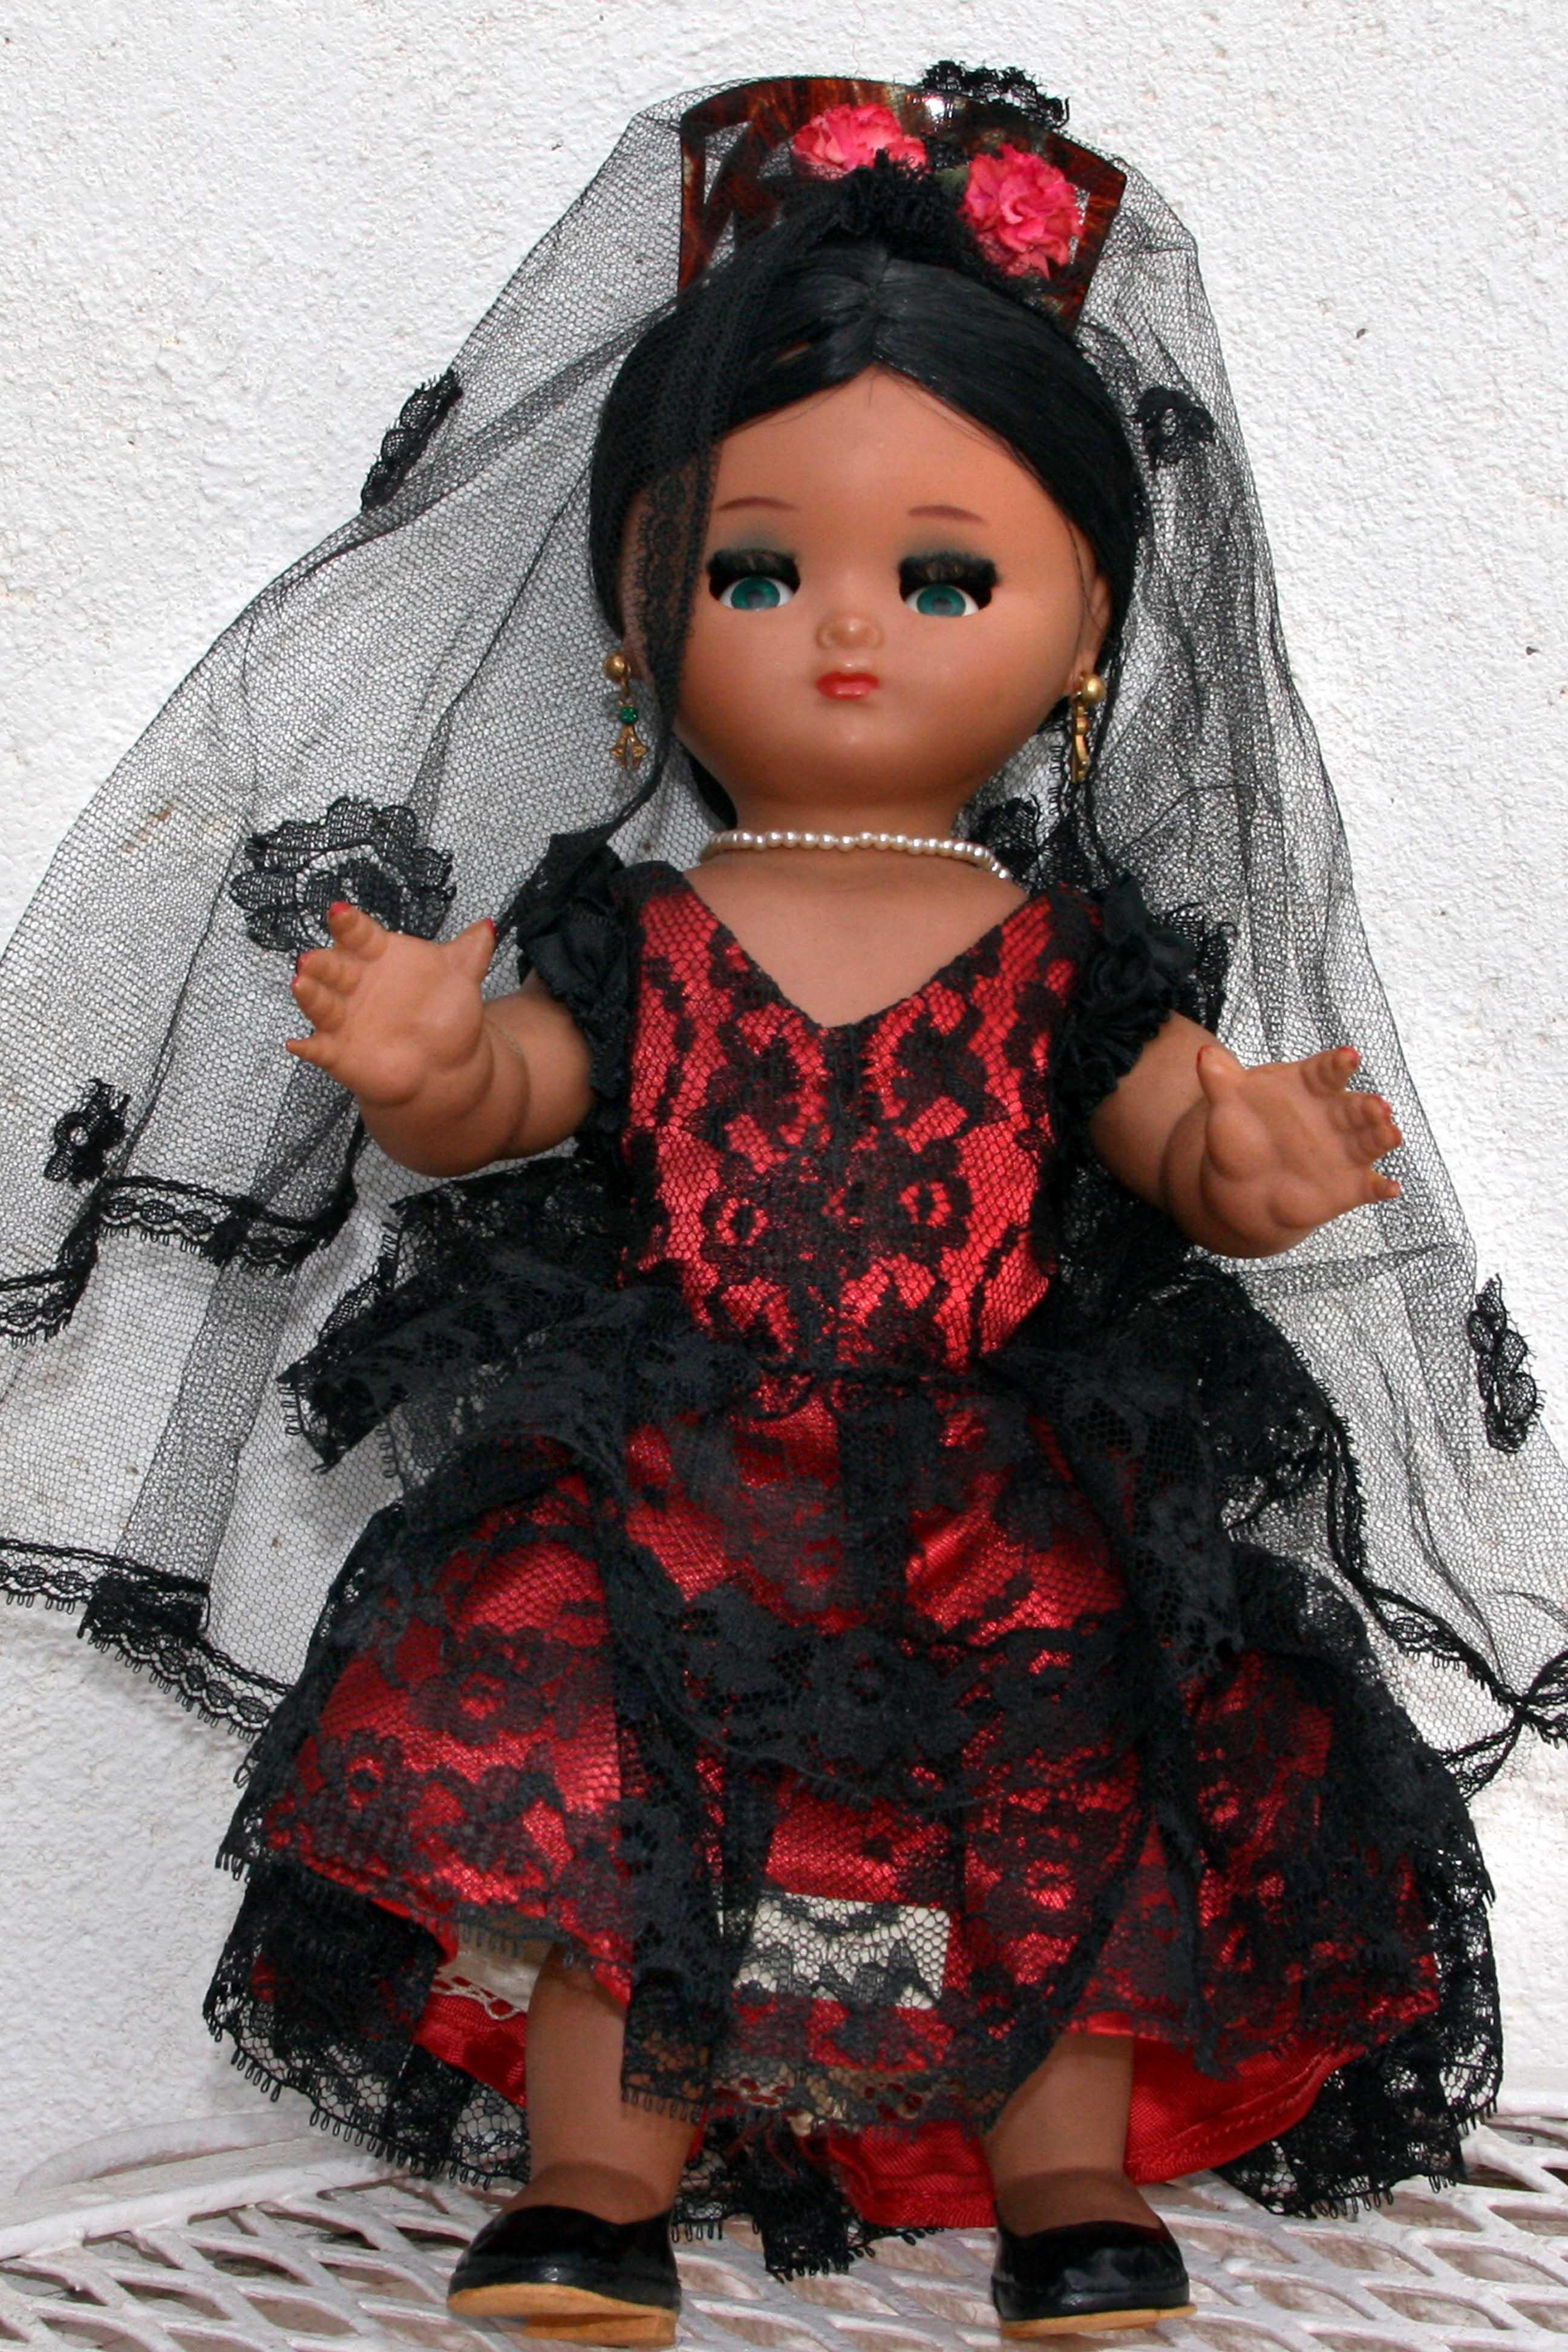 Muñecas Alba | Inicio